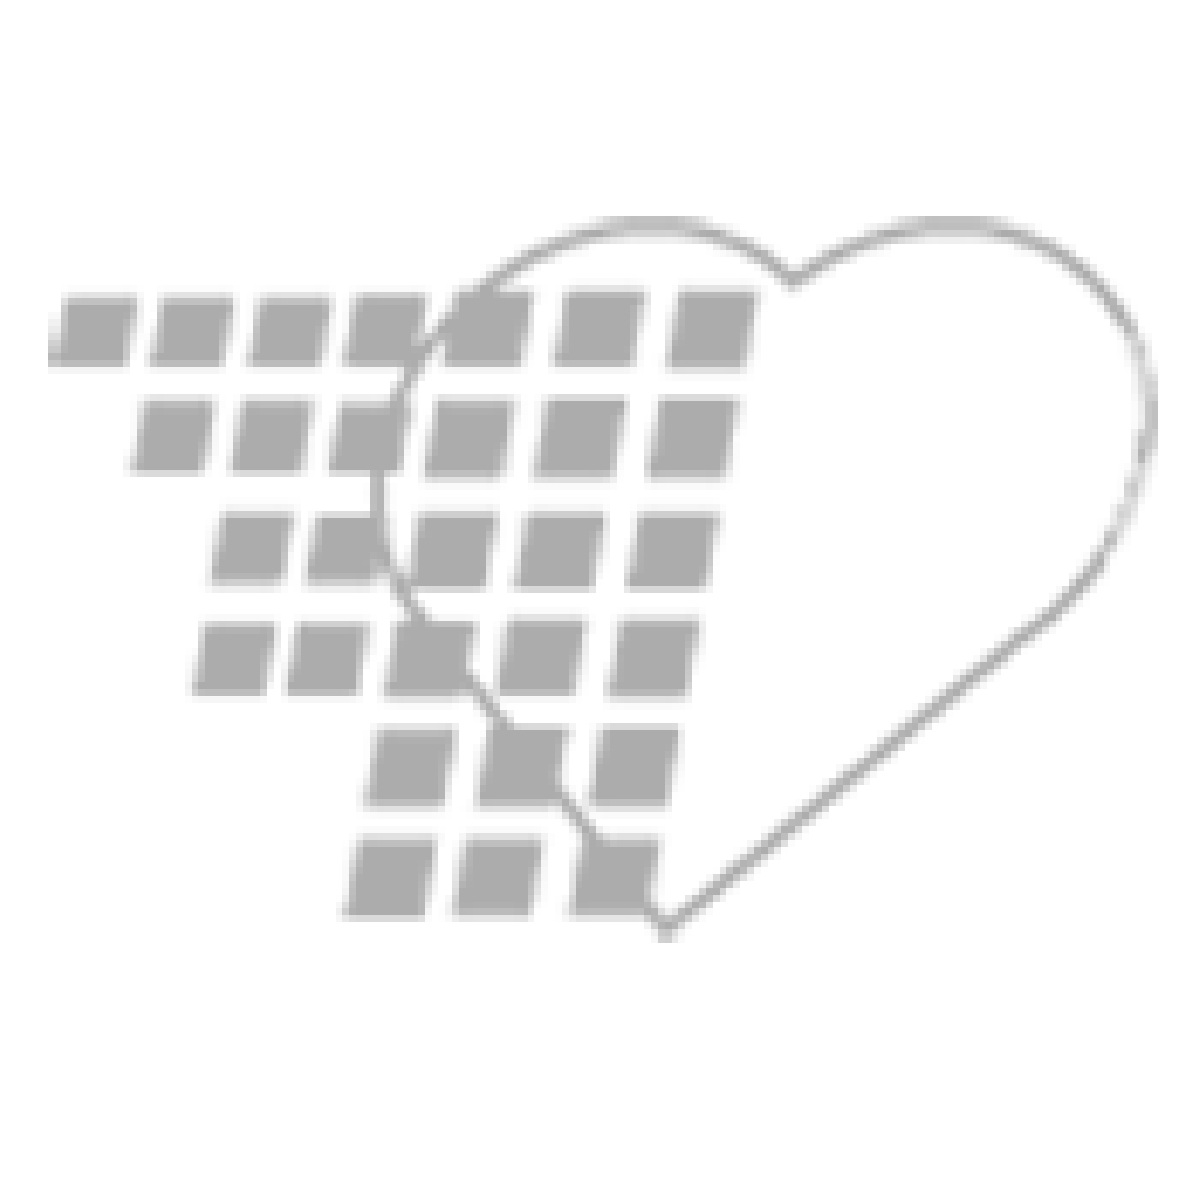 06-93-1104 Demo Dose® Calcim Chlorid 10mL syringe